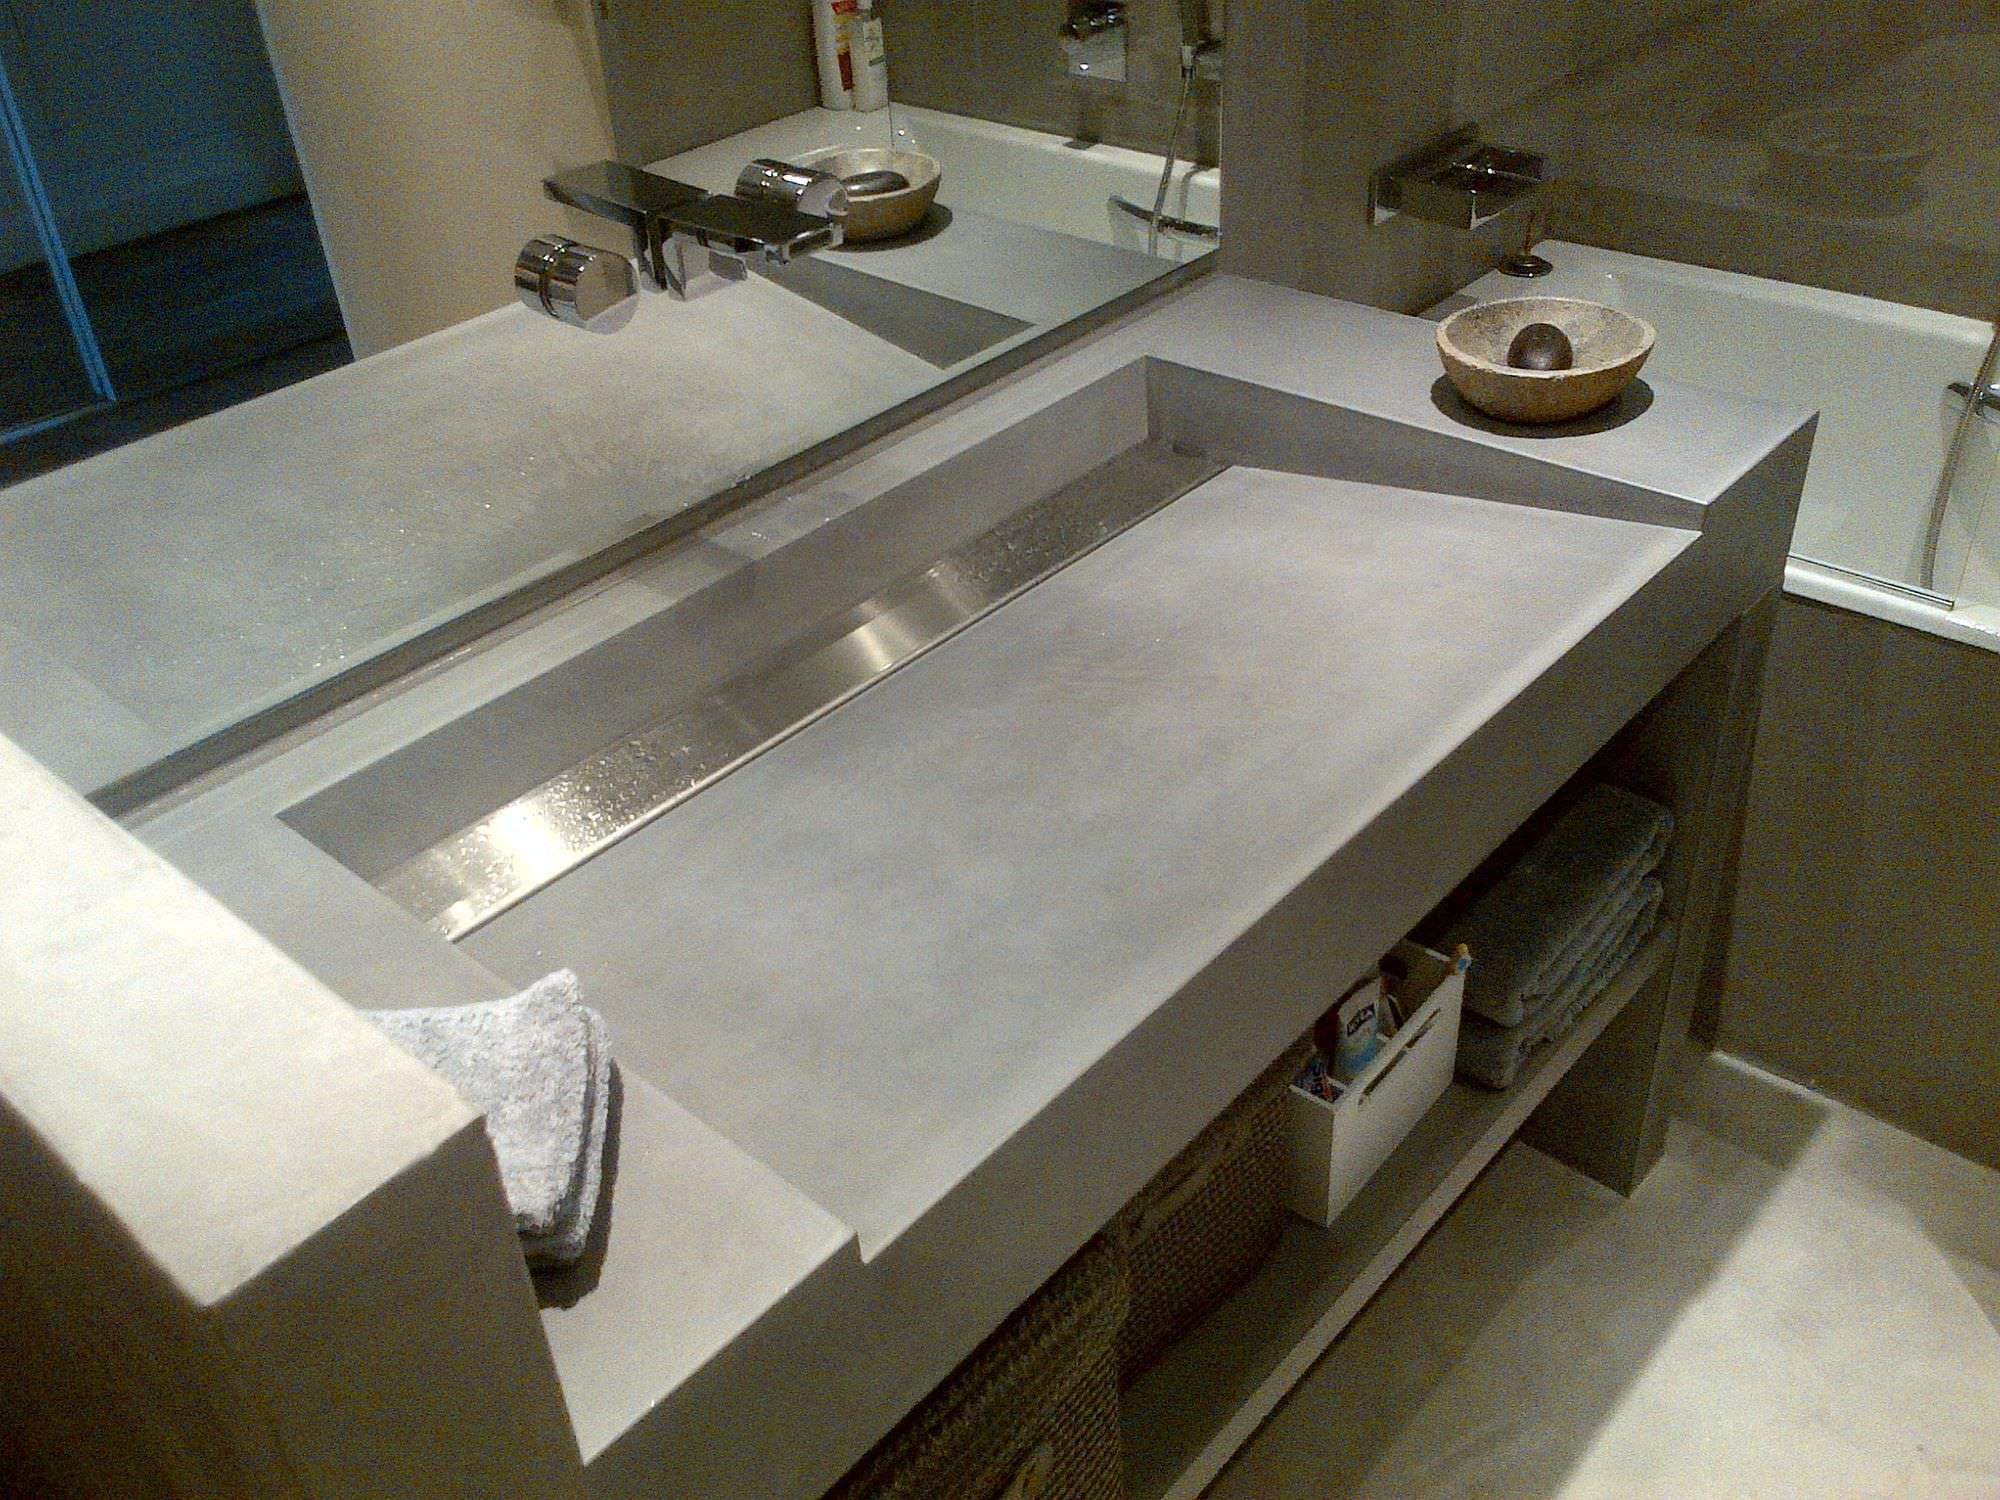 Muebles de lavabo de obra interesting reforma bao con for Muebles de lavabo de obra